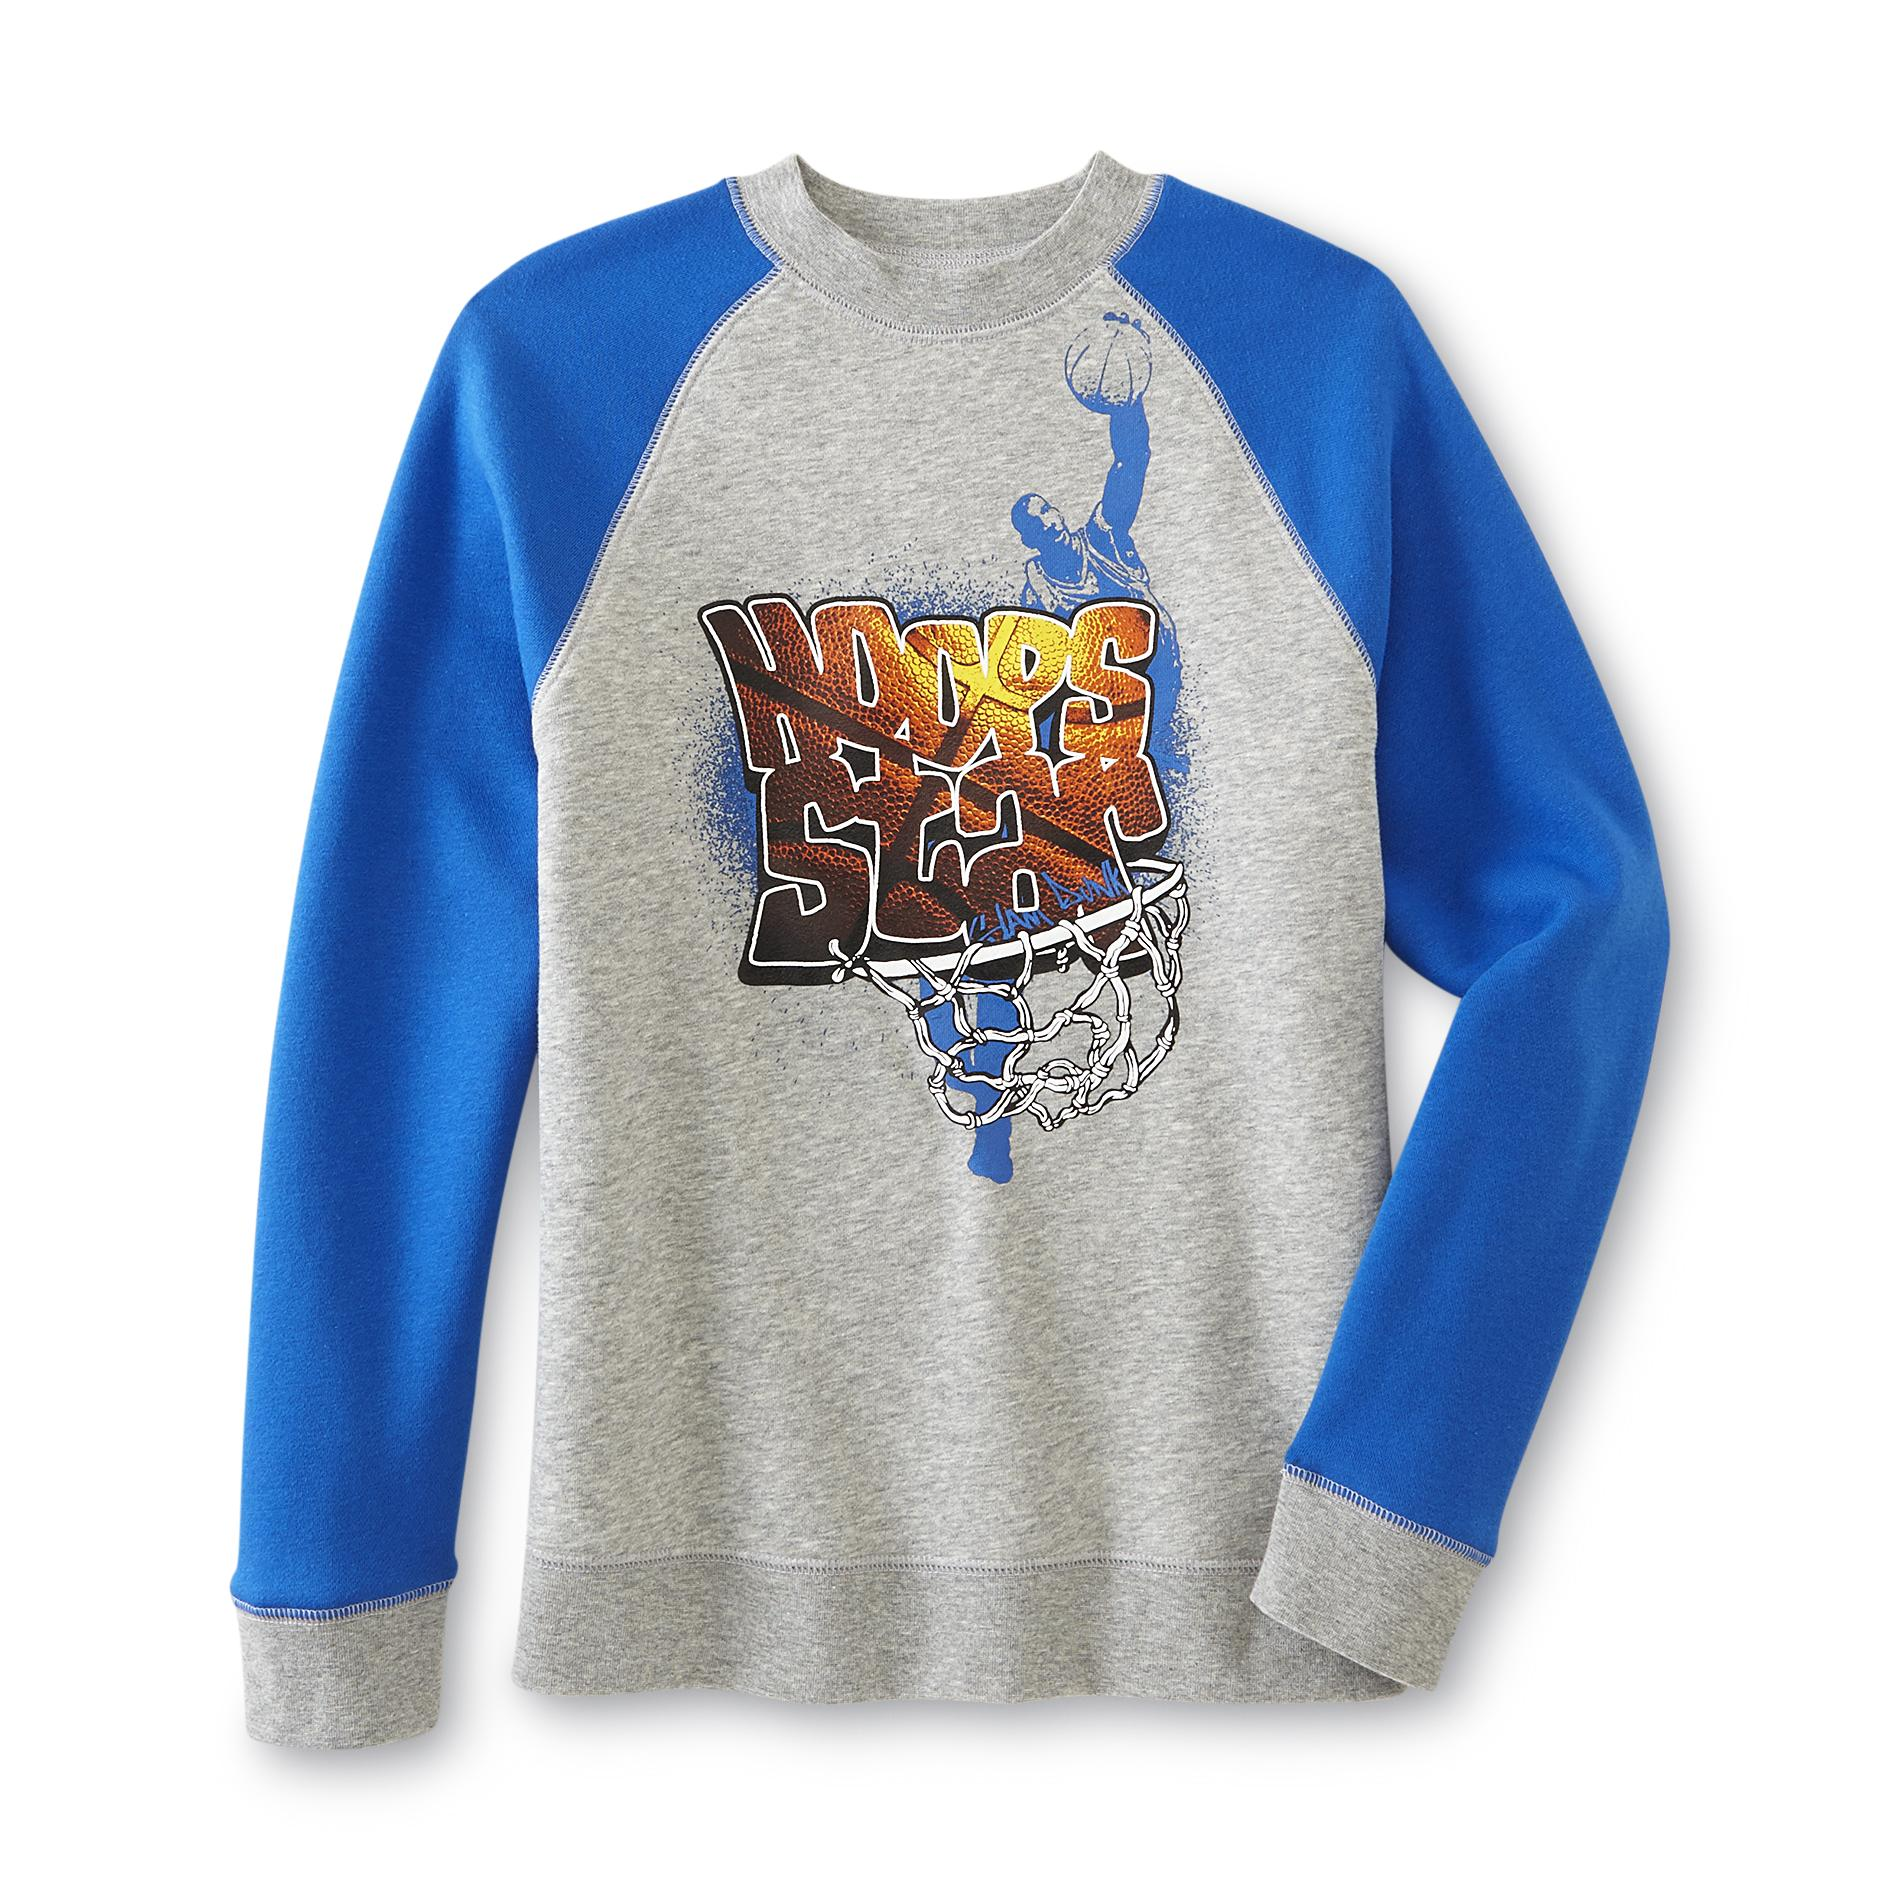 Joe Boxer Boy's Graphic Sweatshirt - Hoops Star